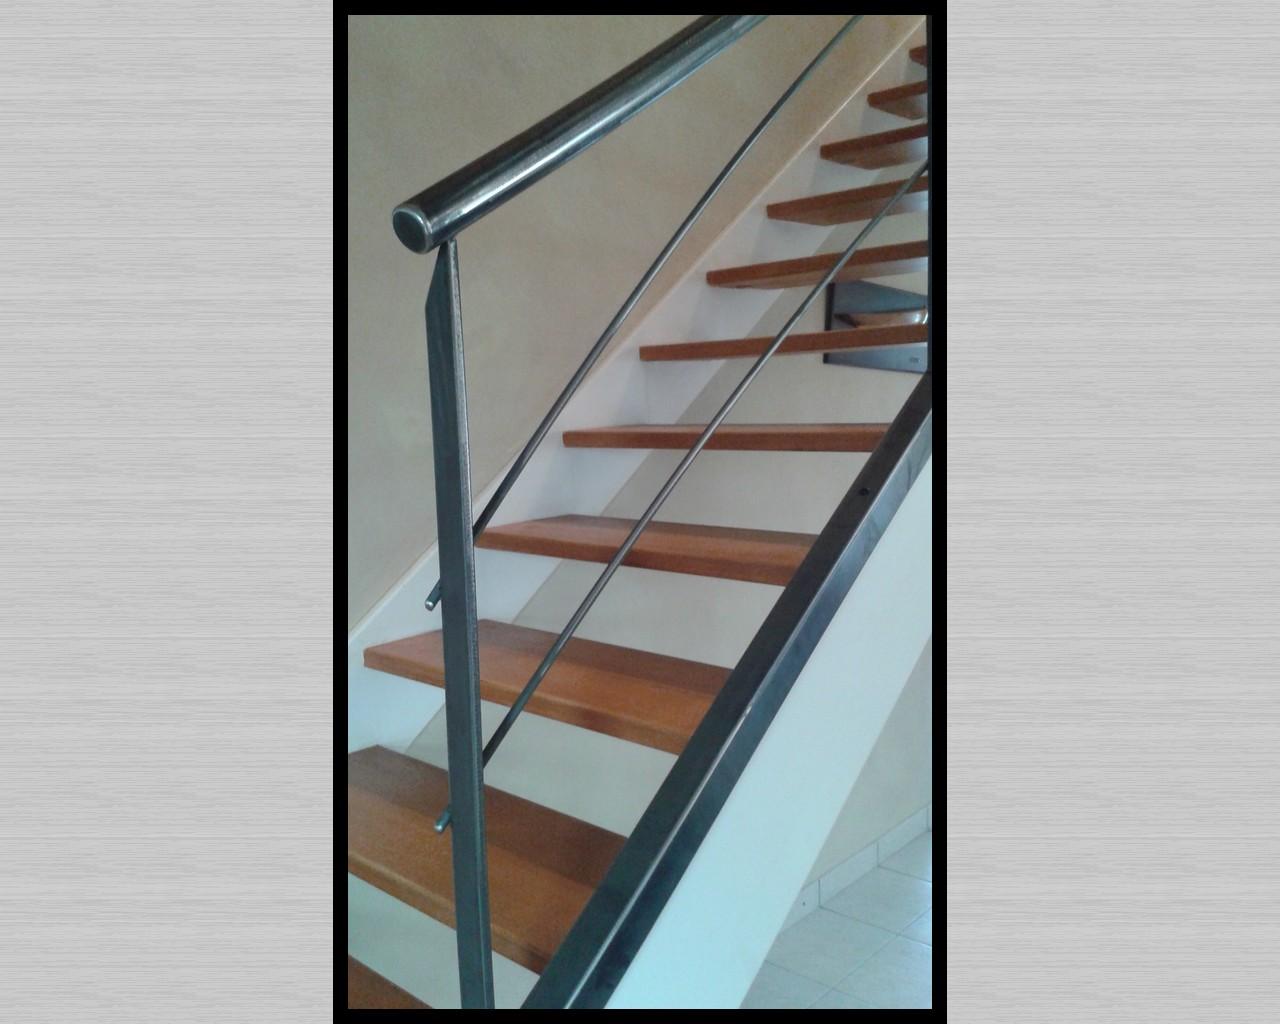 Bien-aimé Escalier métal inox et acier - Arinox NT75